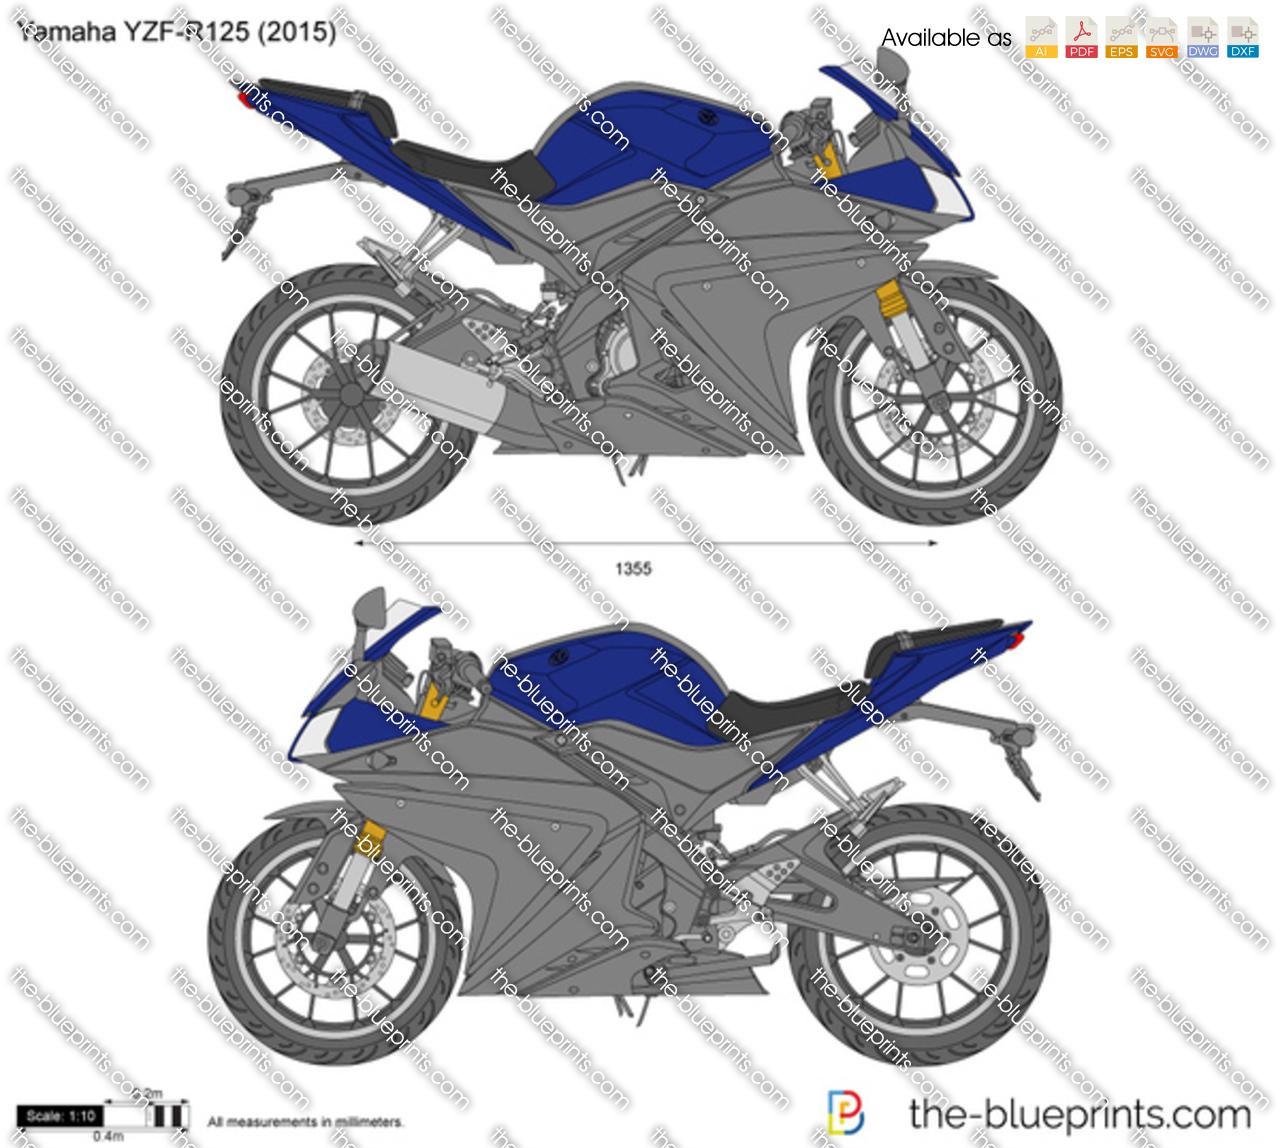 Yamaha YZF-R125 2018